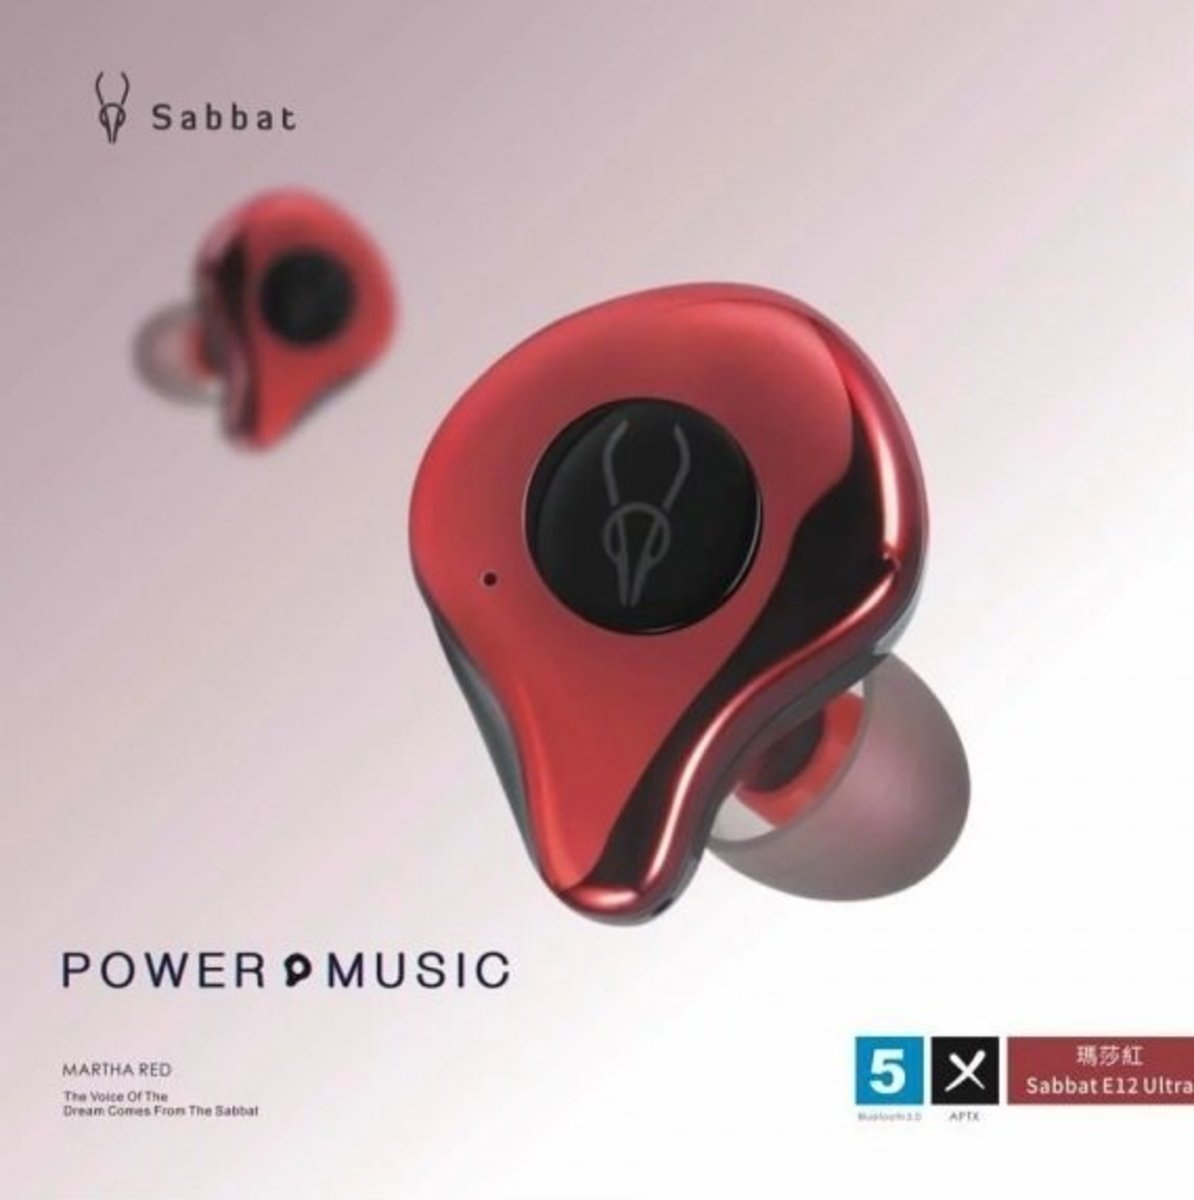 Sabbat E12 Ultra 真無線藍牙耳機(Red)瑪莎紅-平行進口